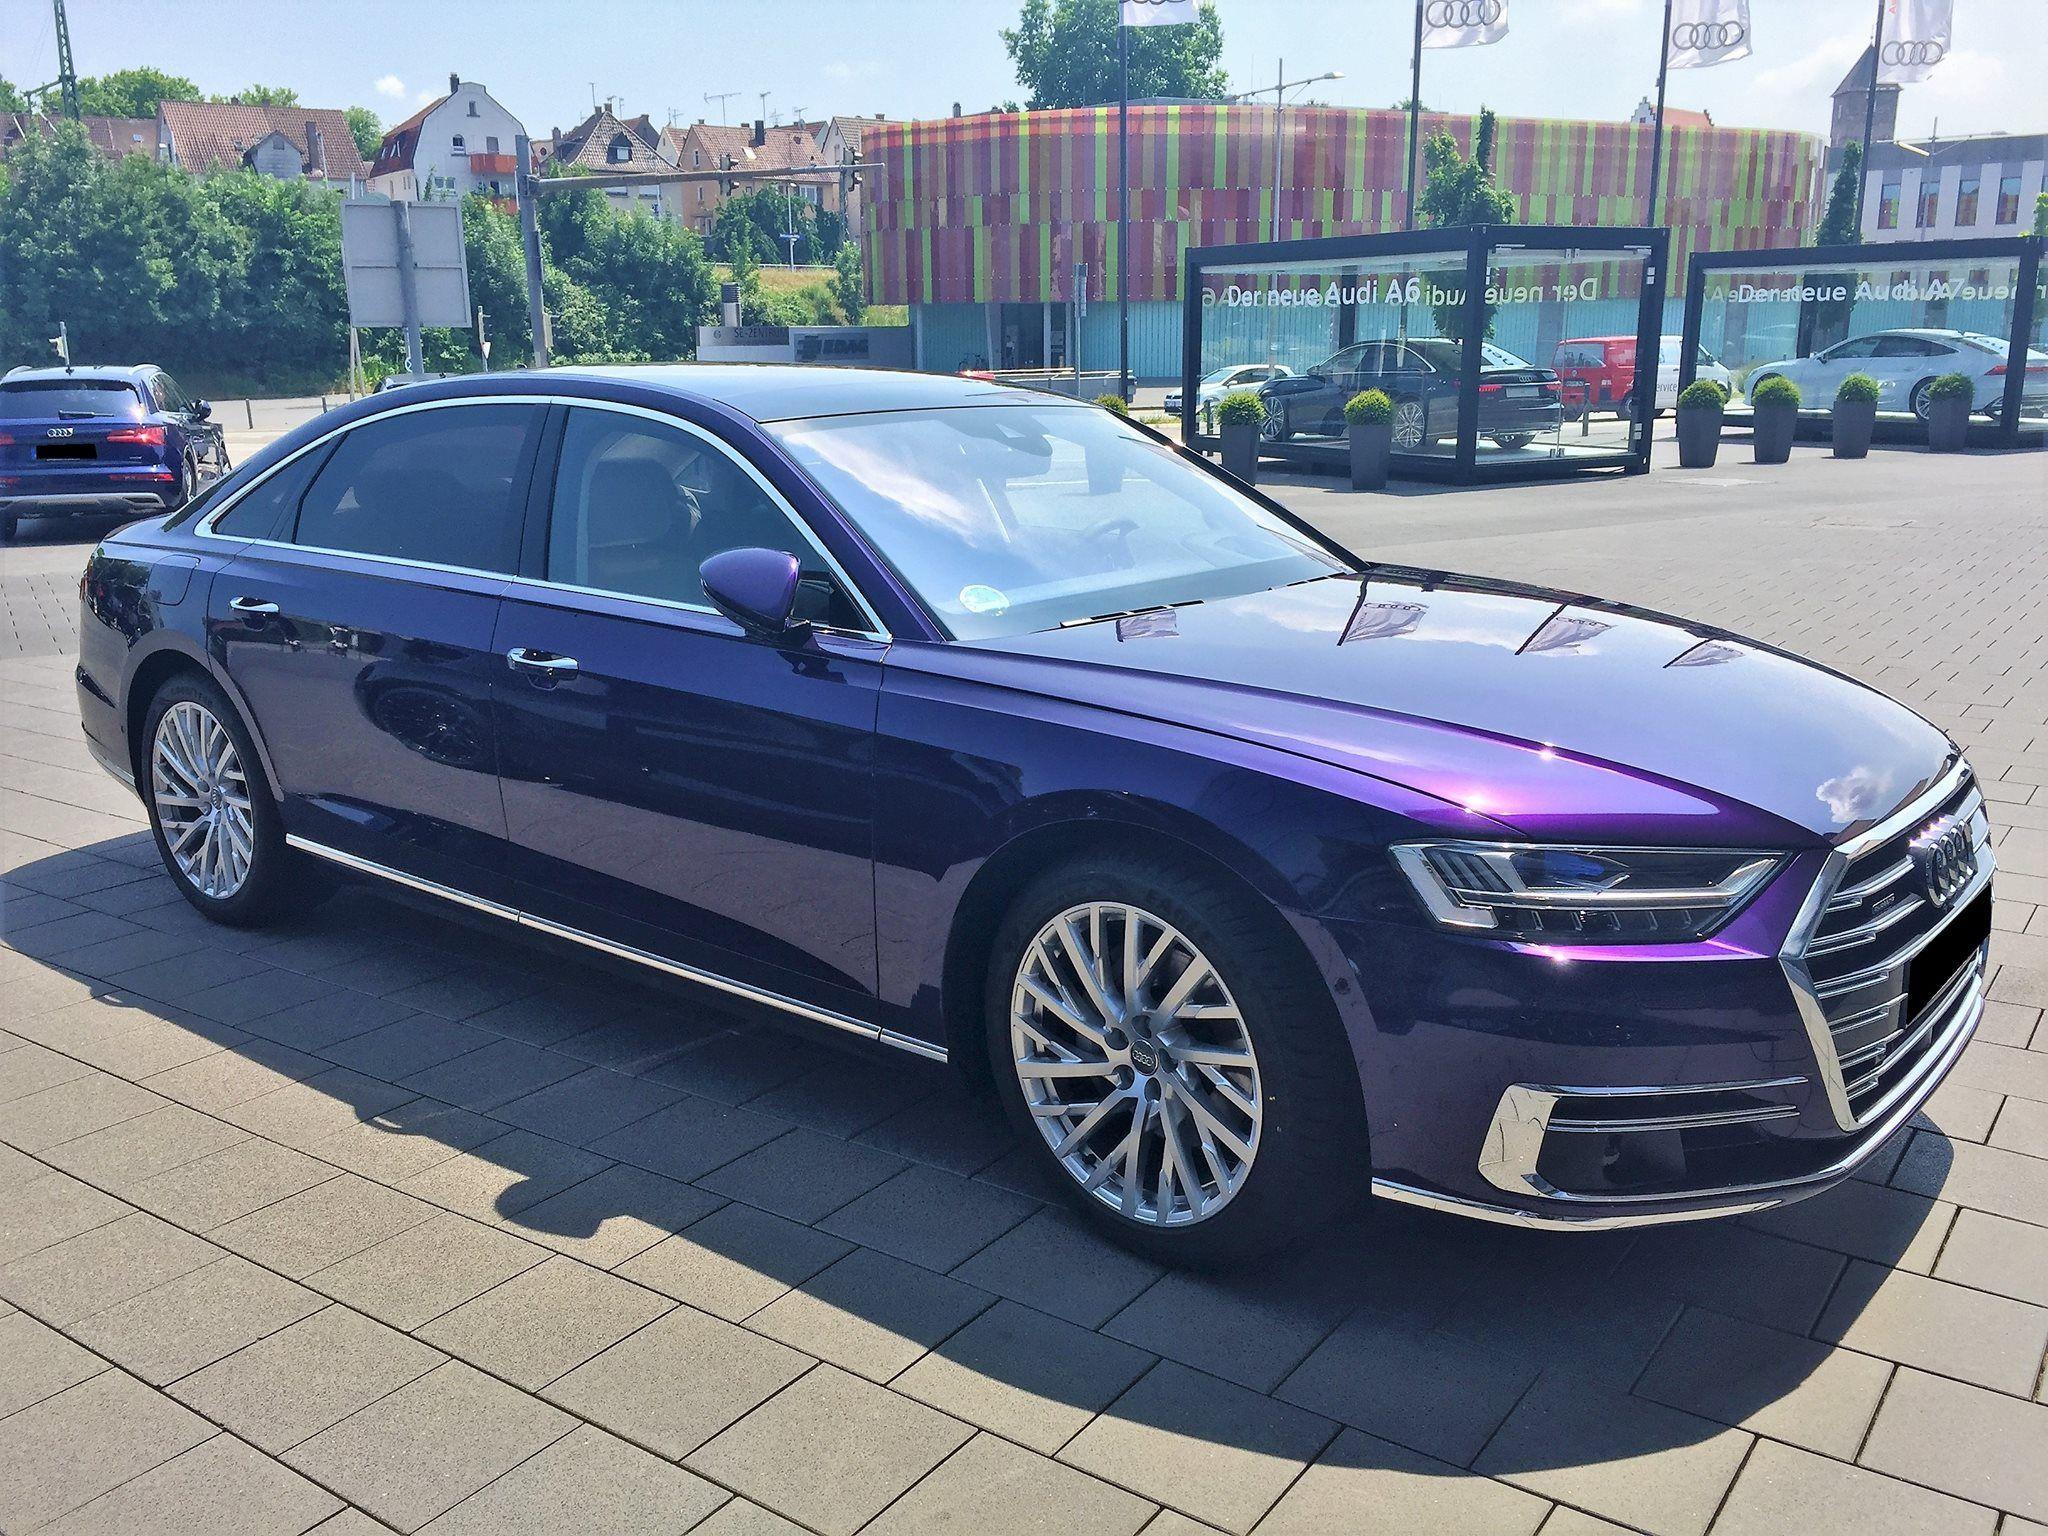 Audi A8 In Velvet Purple Is Worthy Of Being Prince S Car Audi